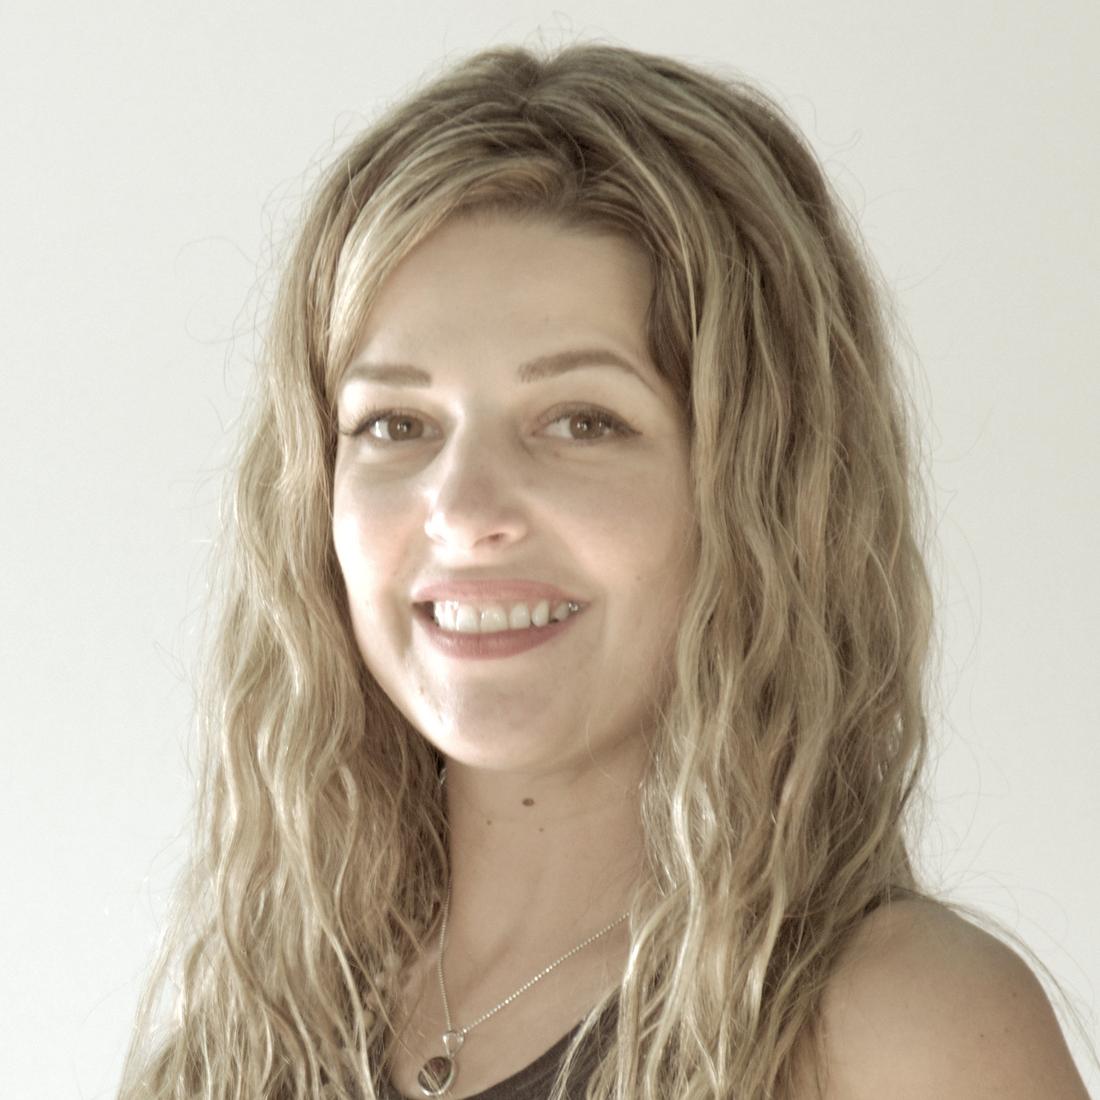 Jessica Lallier Owner of Namaste Studio and Yoga Instructor